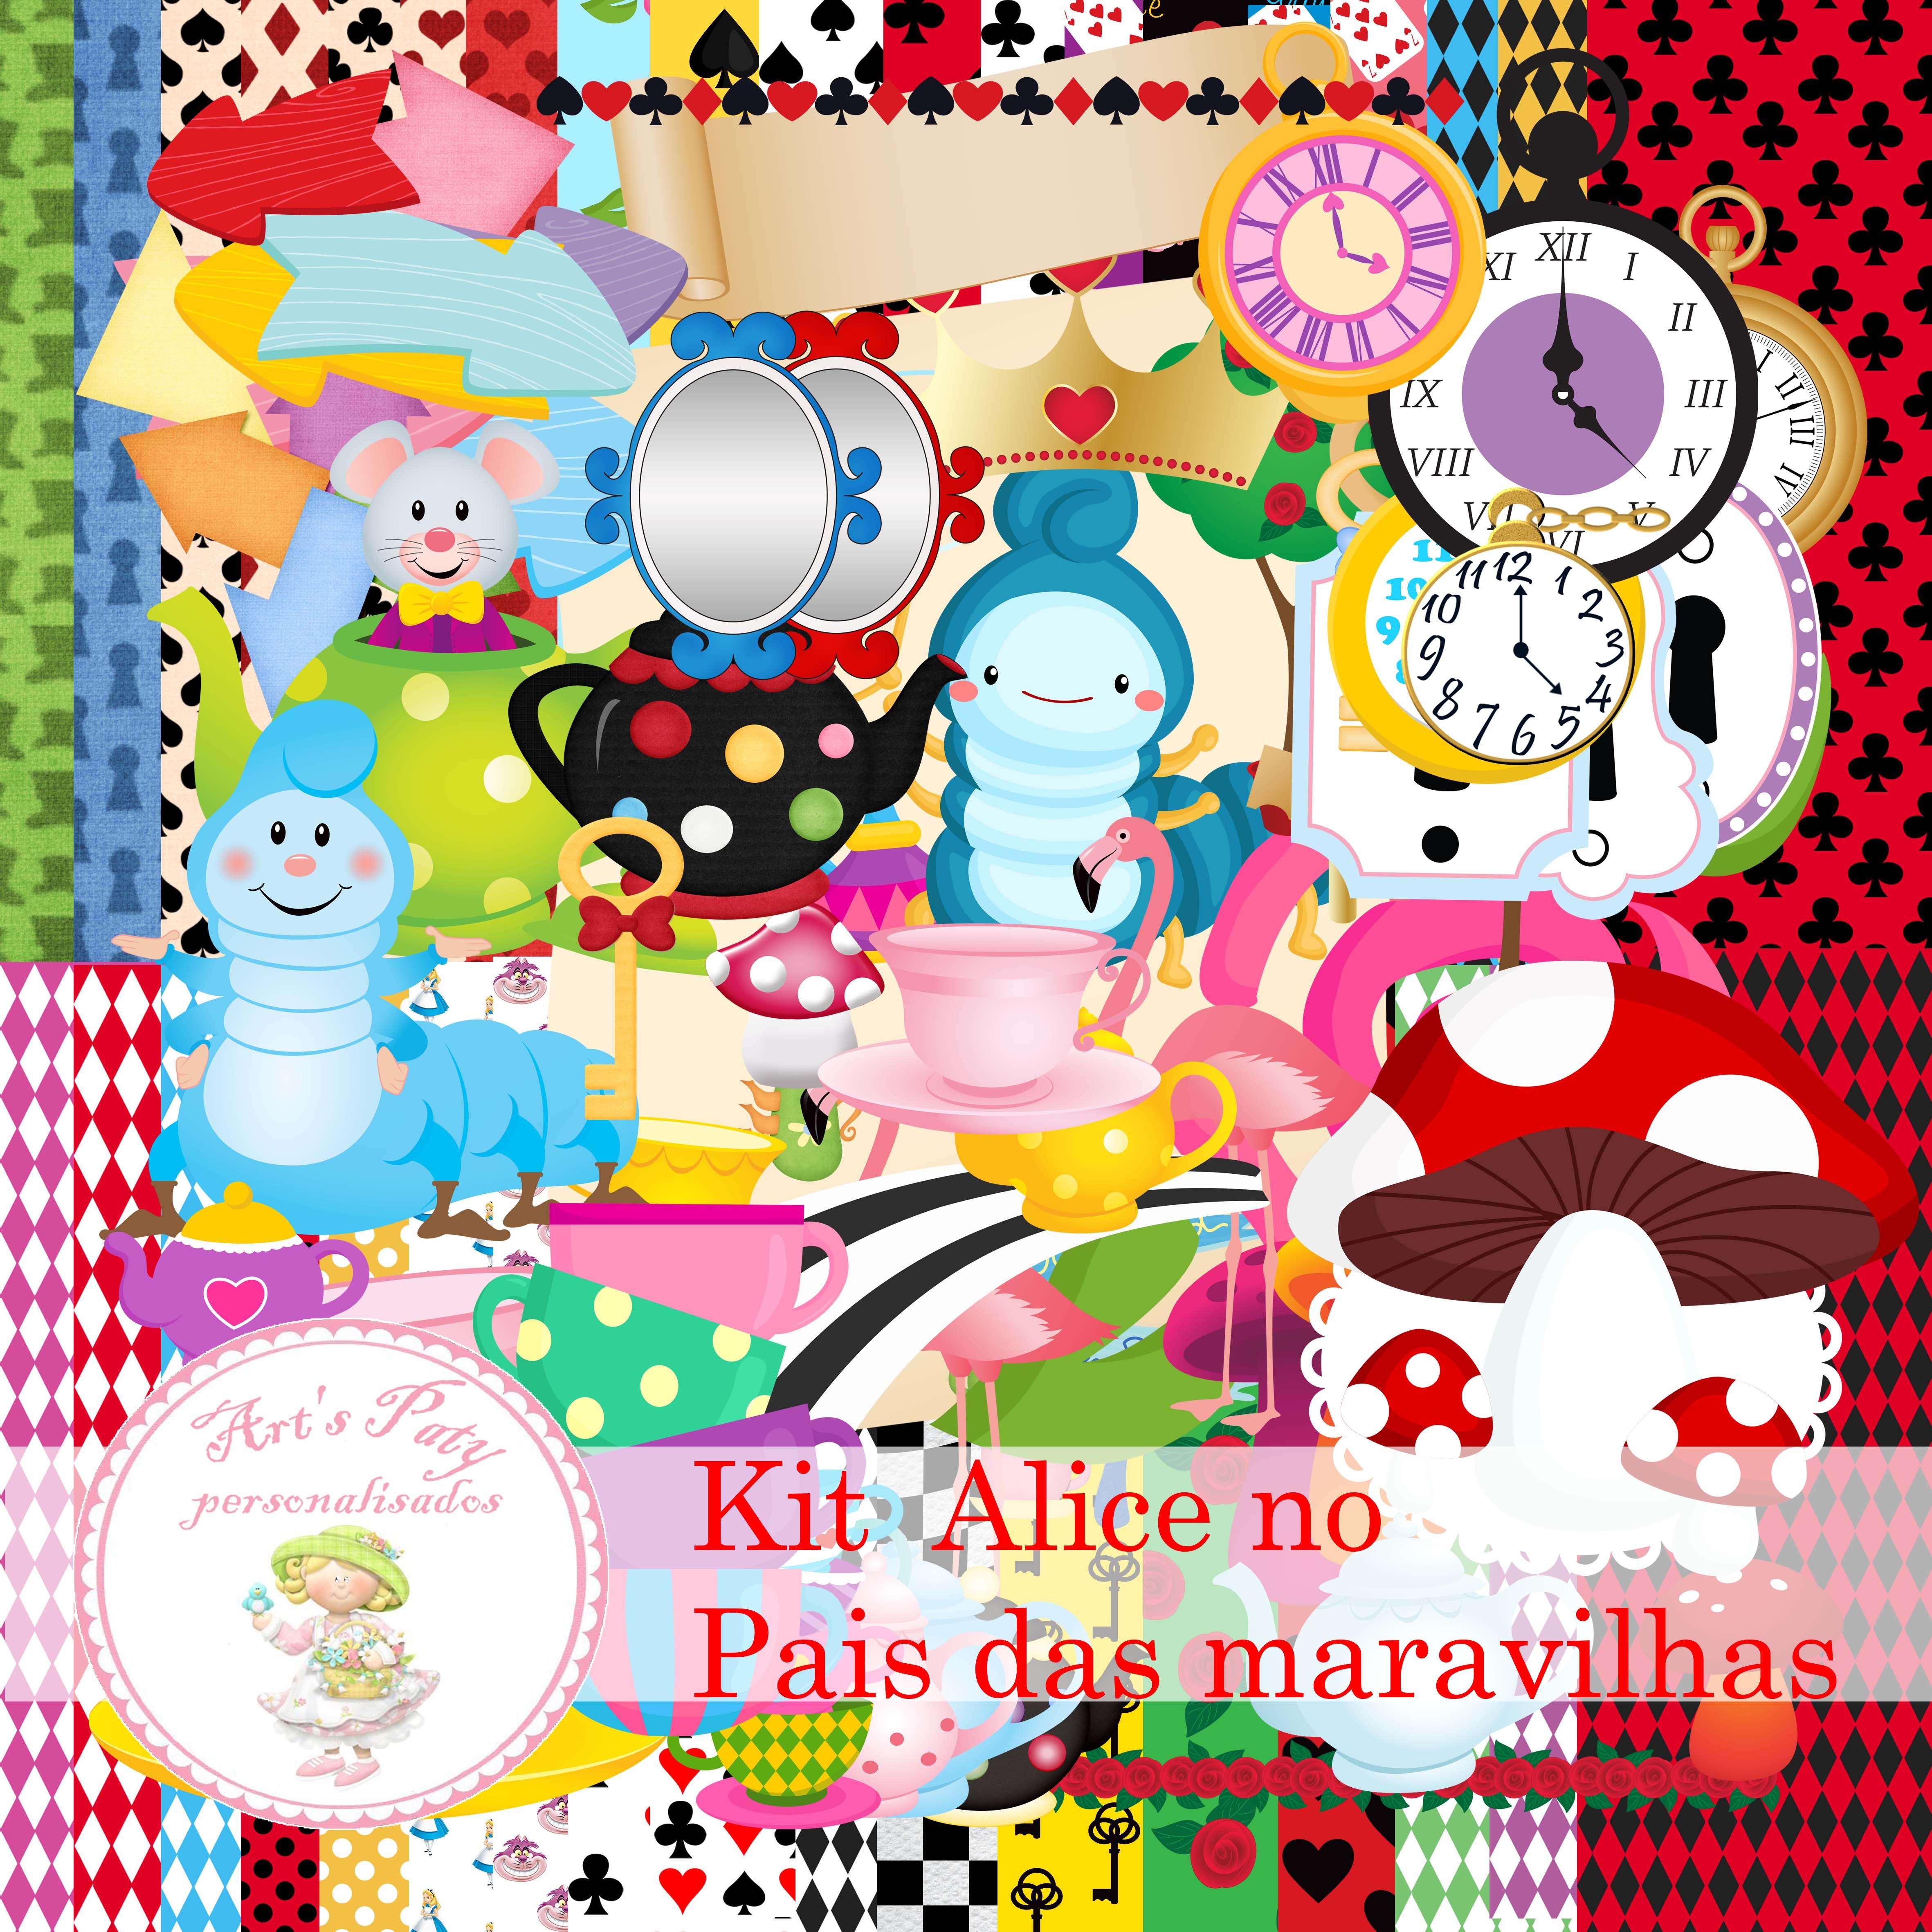 Natal Wallpaper 3d Kit Digital Alice No Pais Das Maravilhas Arts Paty